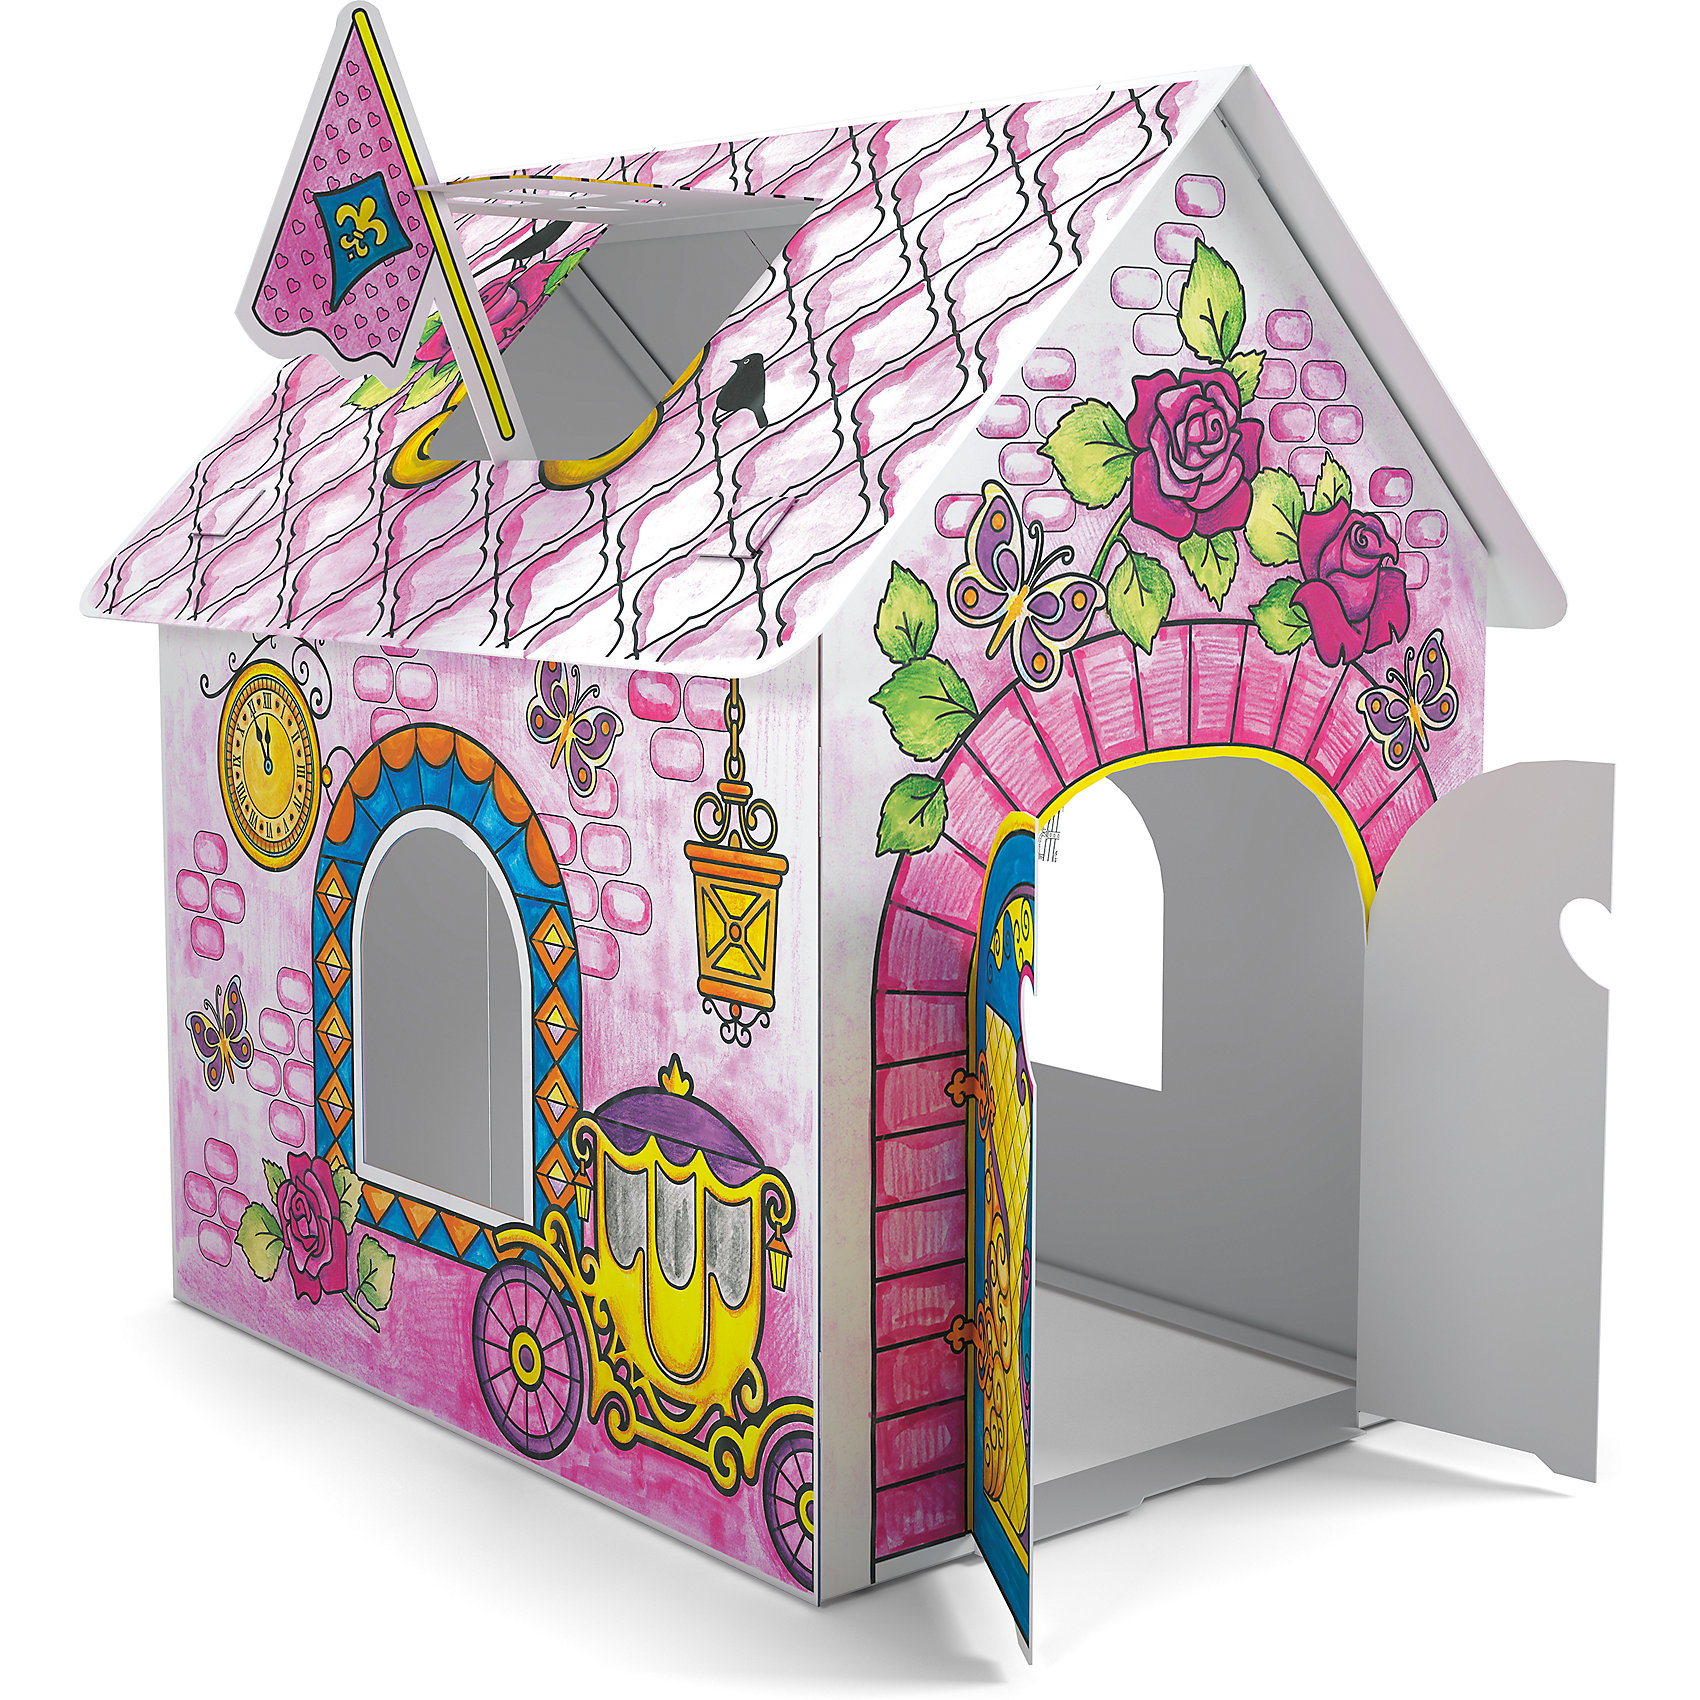 ErichKrause Домик для раскрашивания Замок принцессы barneybuddy barneybuddy игрушки для ванны стикеры замок принцессы